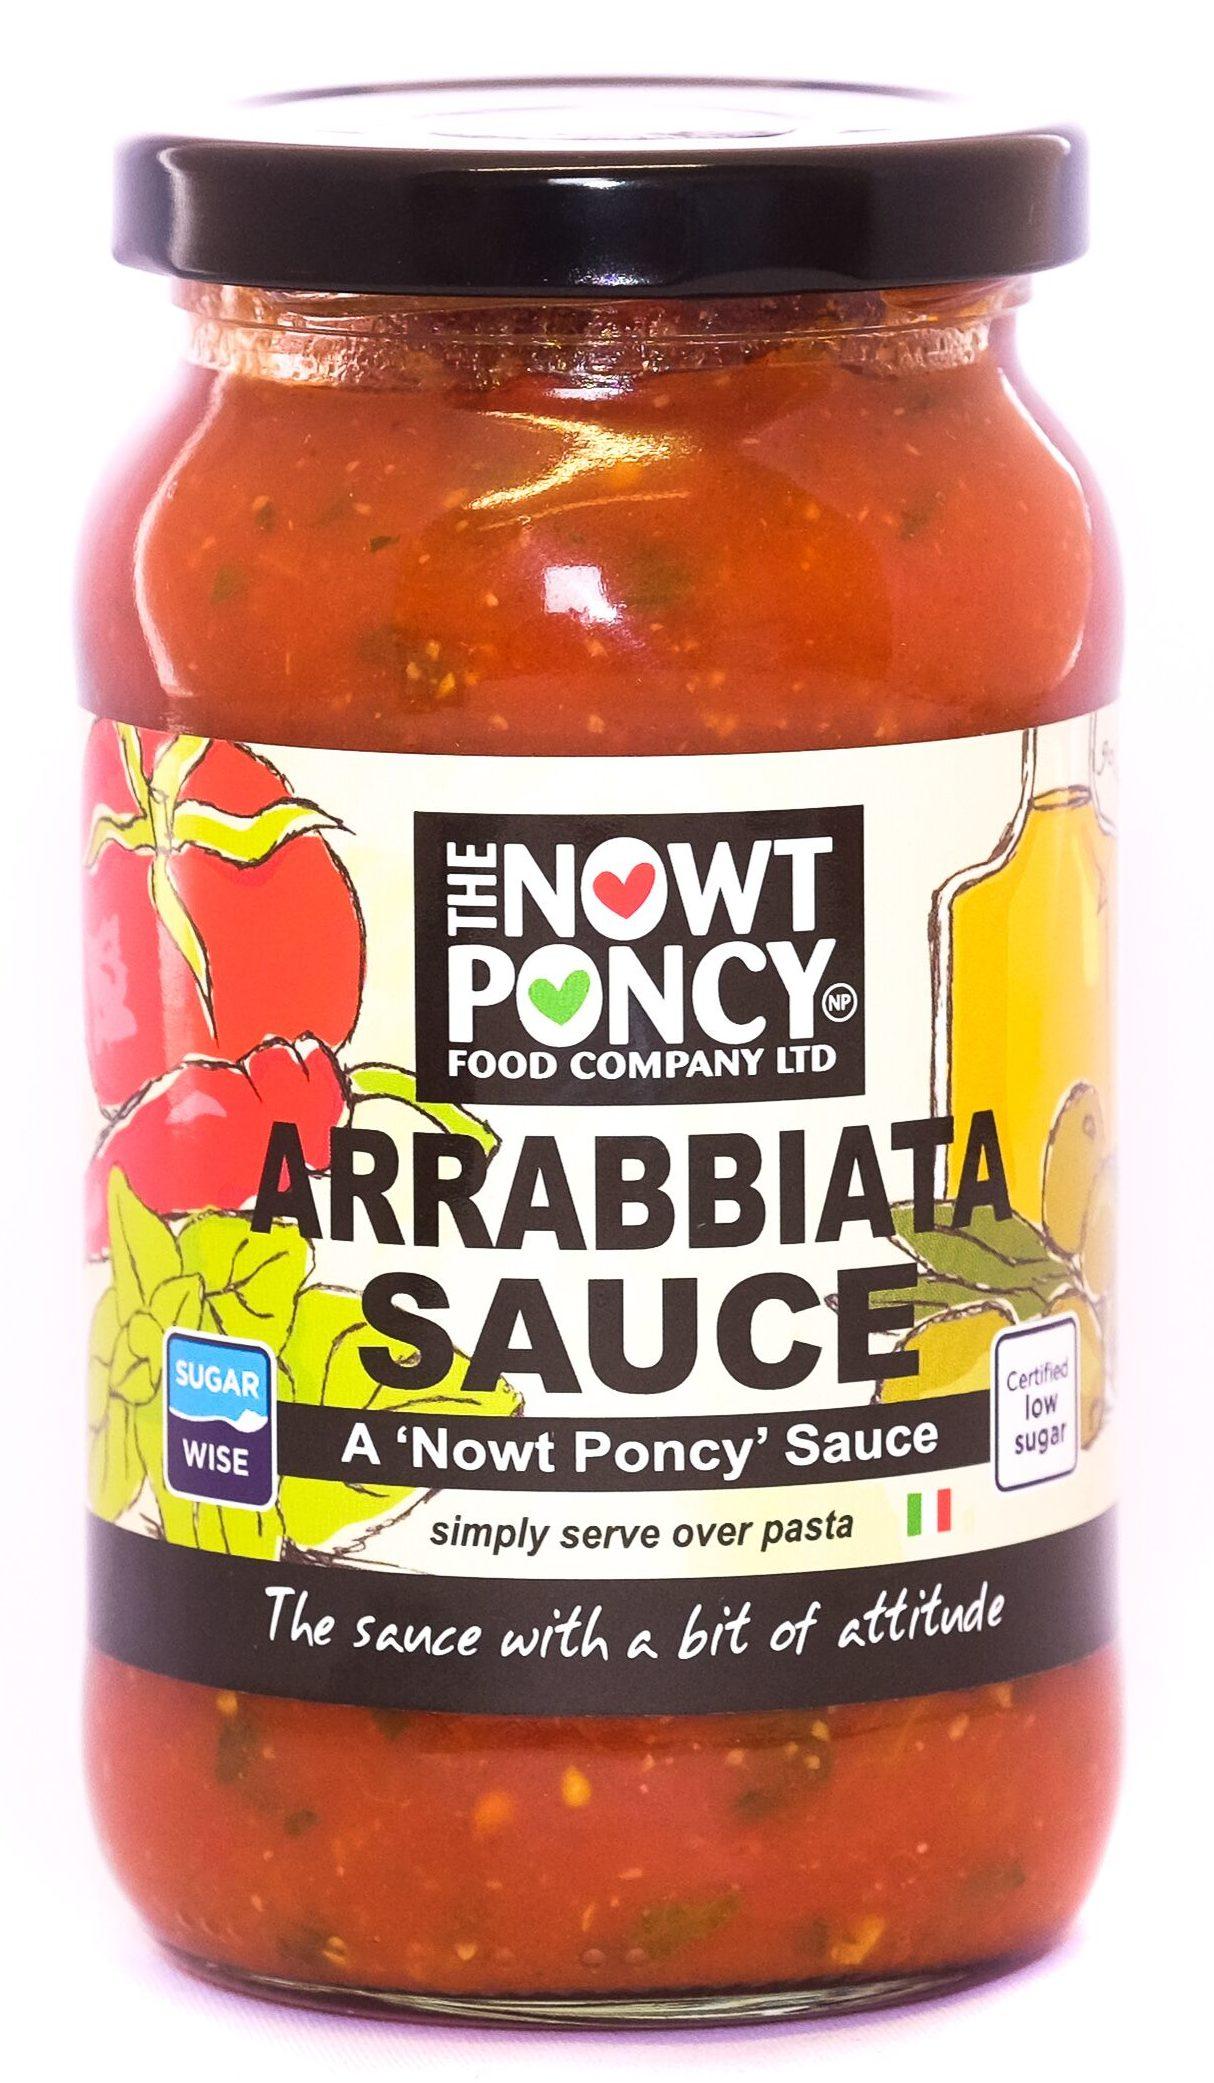 Nowt Poncy Arrabbiata Sauce